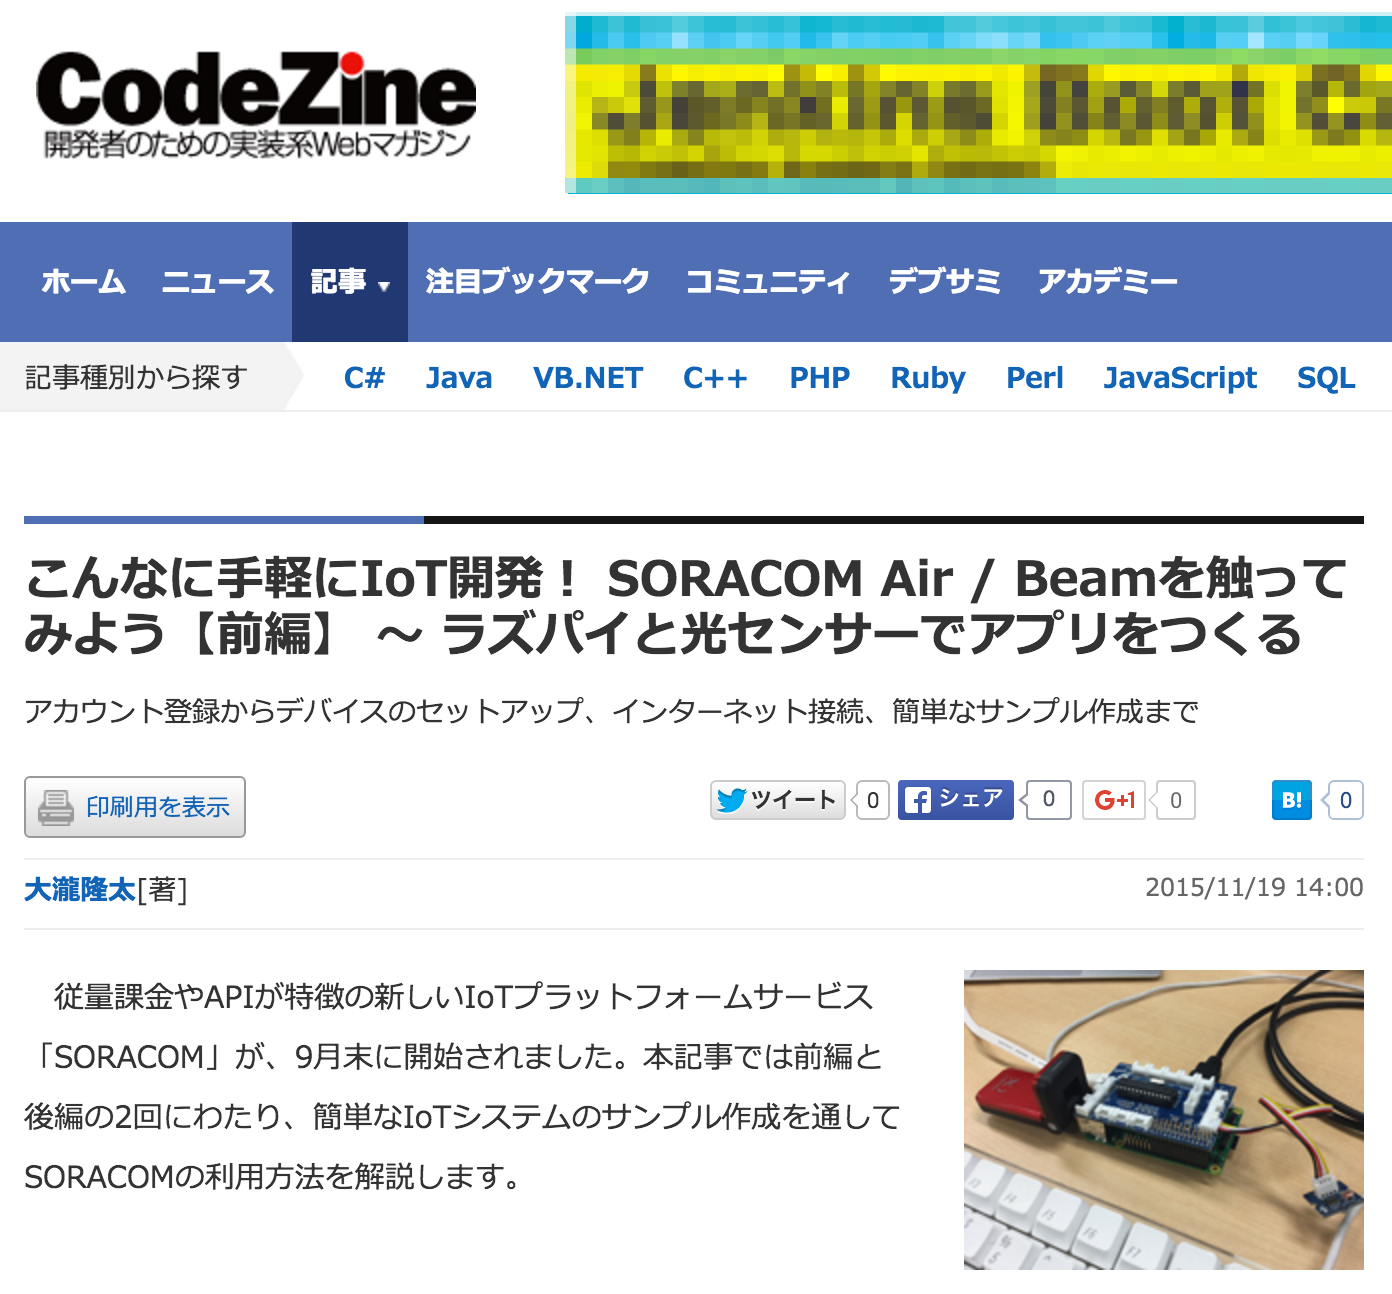 codezine-soracom1